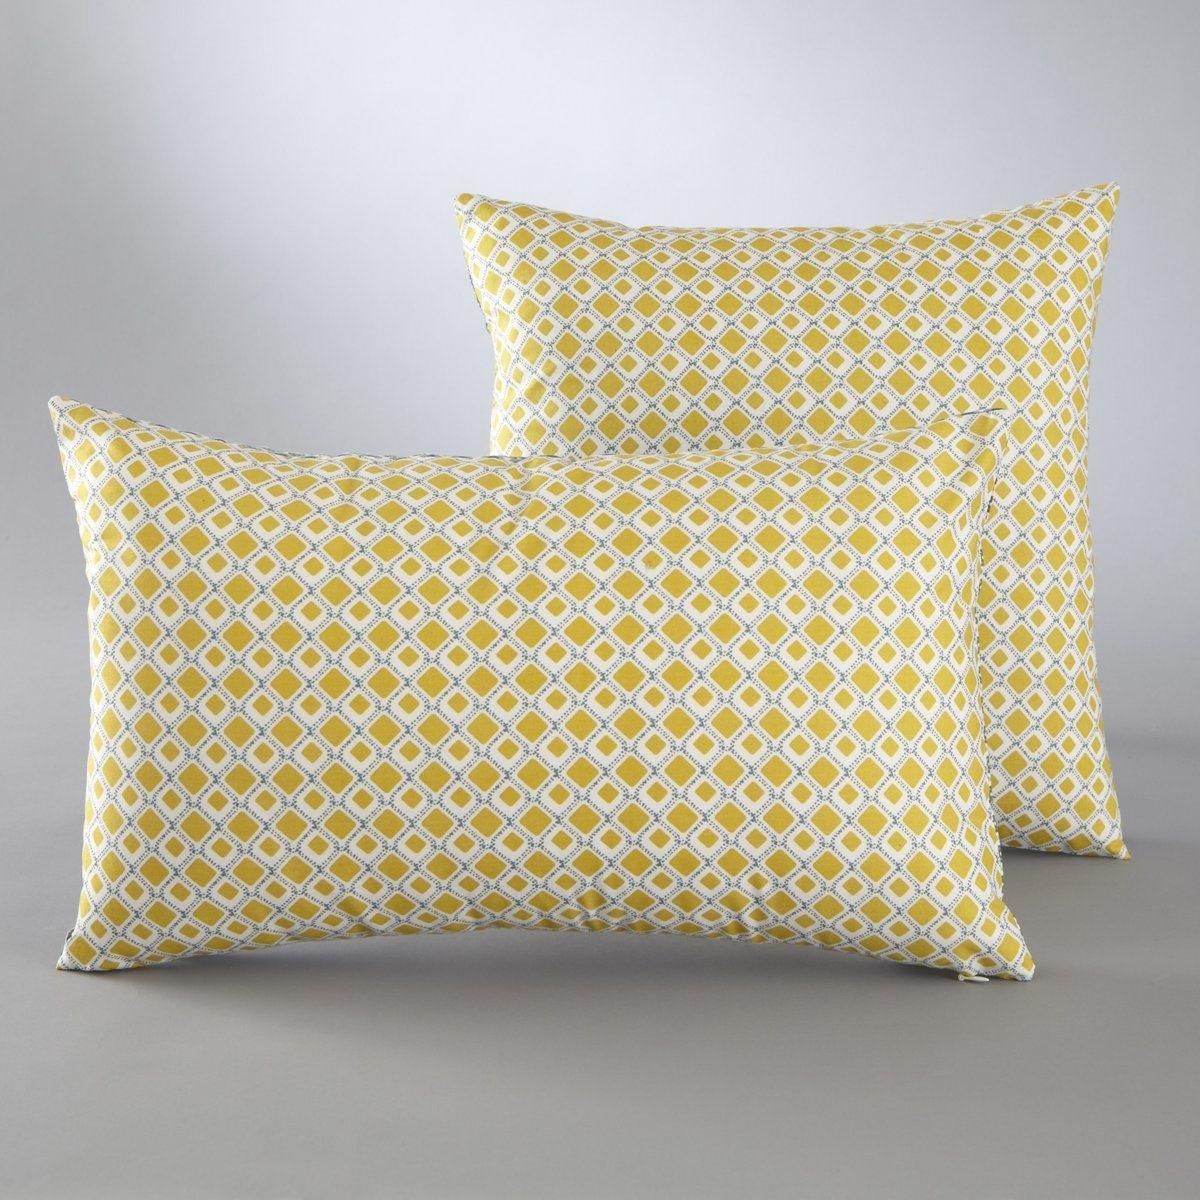 Чехол La Redoute Для подушки с галстучным рисунком MASHITA 50 x 30 см желтый льняной la redoute чехол для подушки georgette 50 x 30 см желтый